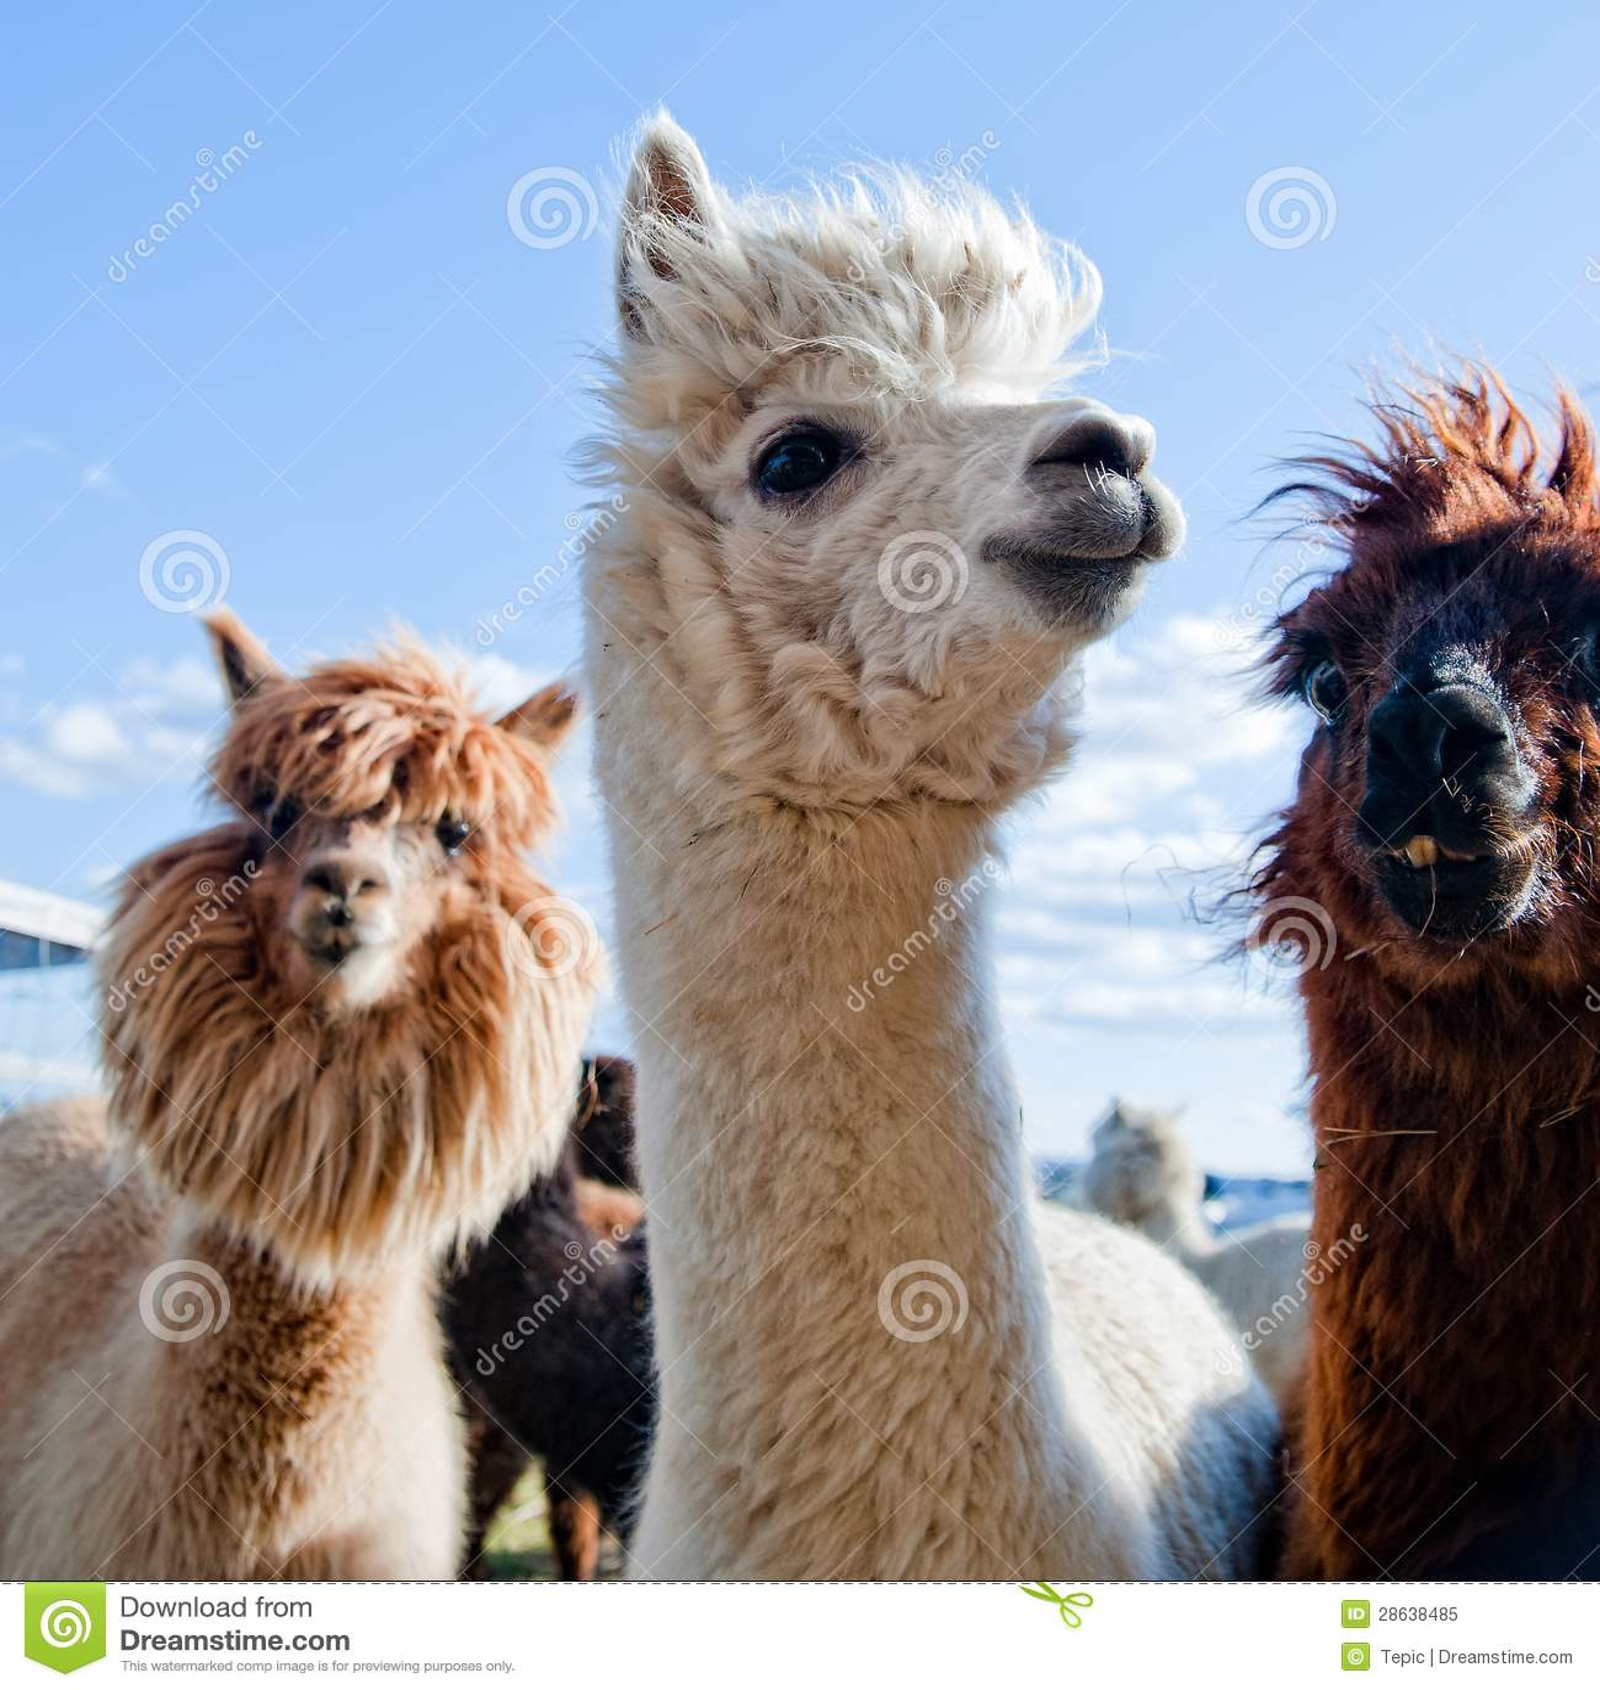 Exotic Animal Wallpaper Three Funny Alpacas Royalty Free Stock Photo Image 28638485